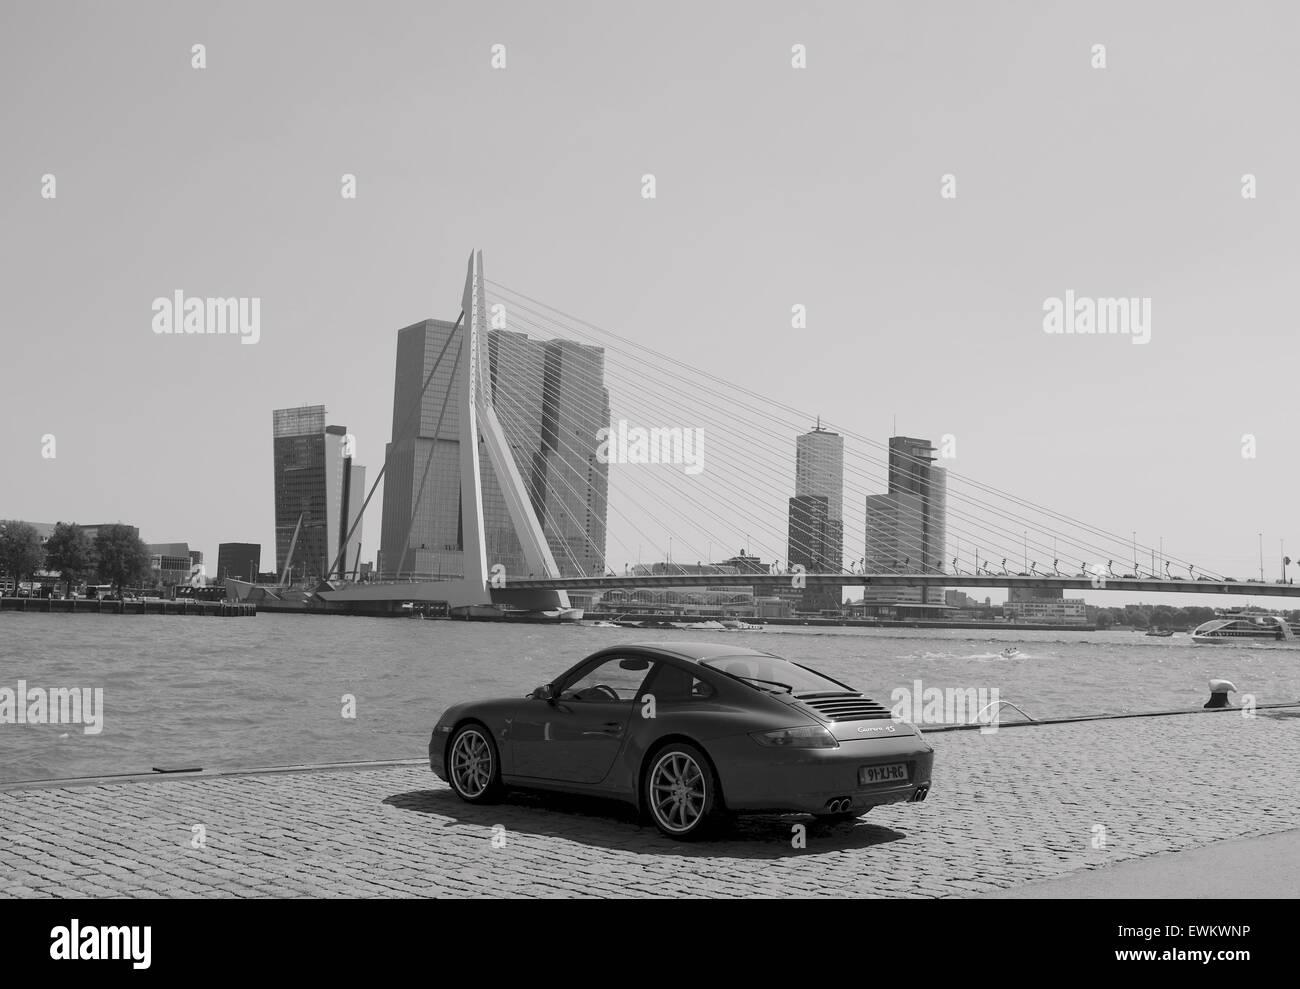 Rotterdam Skyline. The Netherlands. Stock Photo